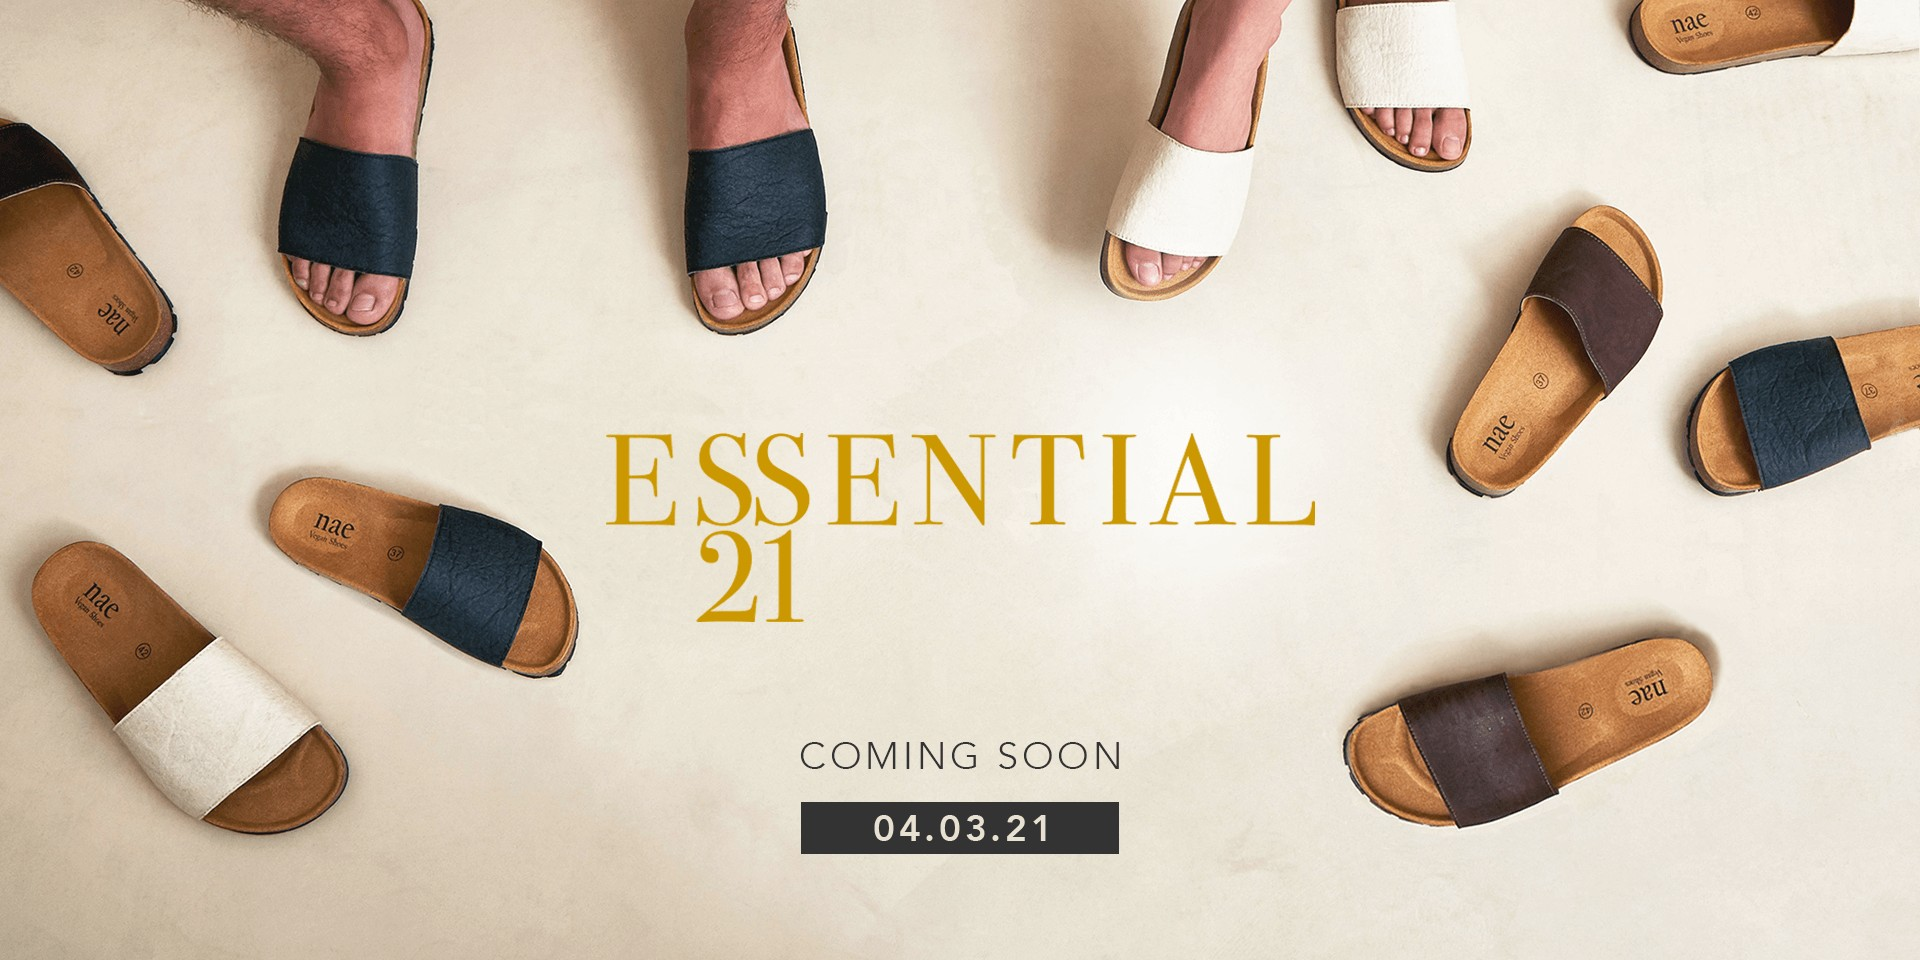 Vegane Schuhe - Coming soon